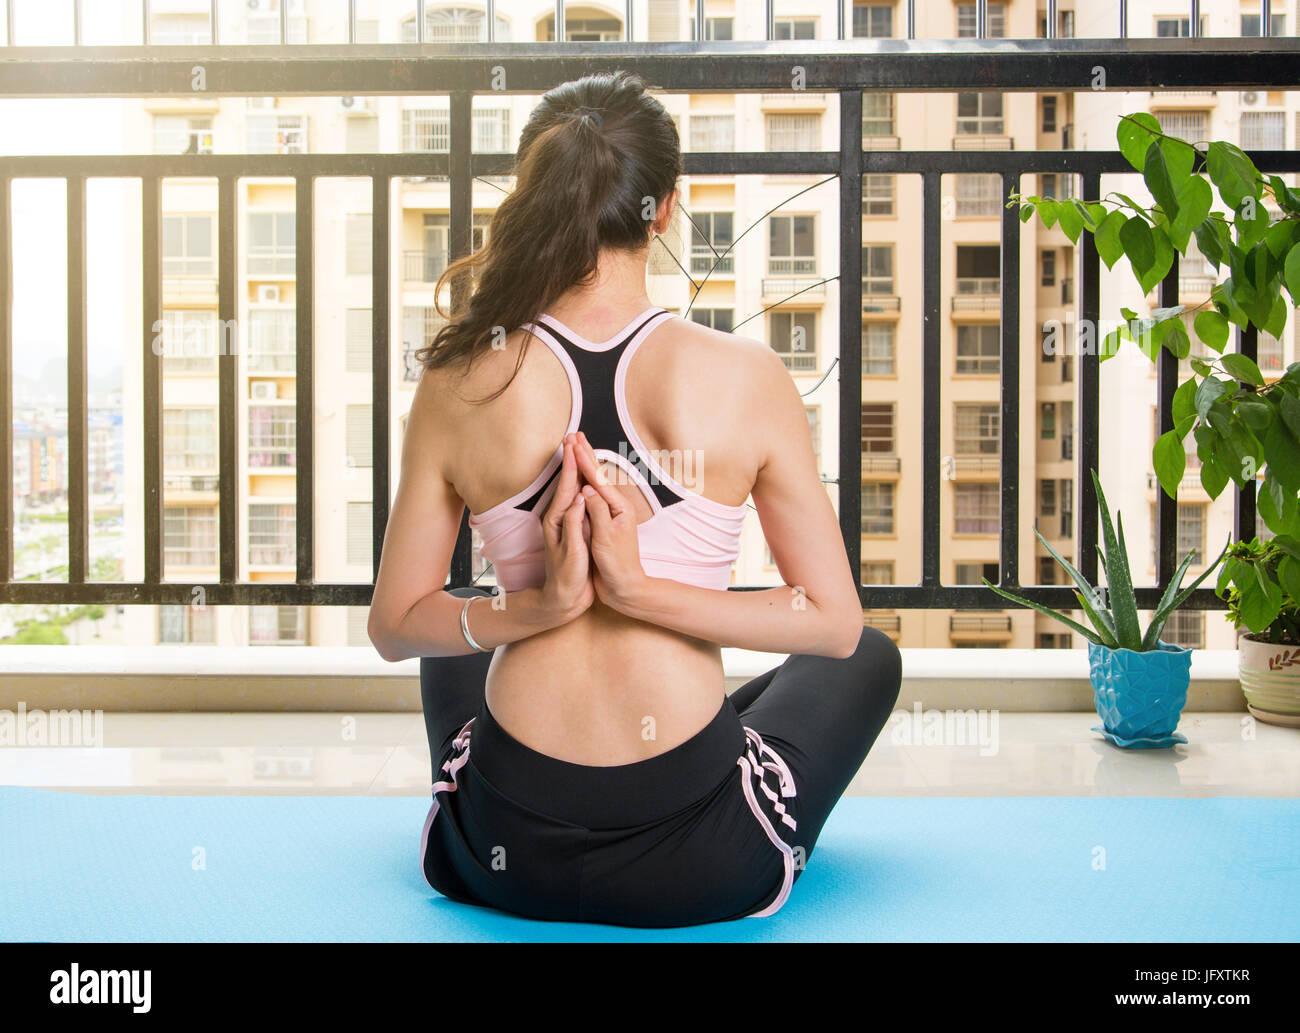 Girl doing Pashchima namaskarasana, Reverse Prayer yoga pose - Stock Image